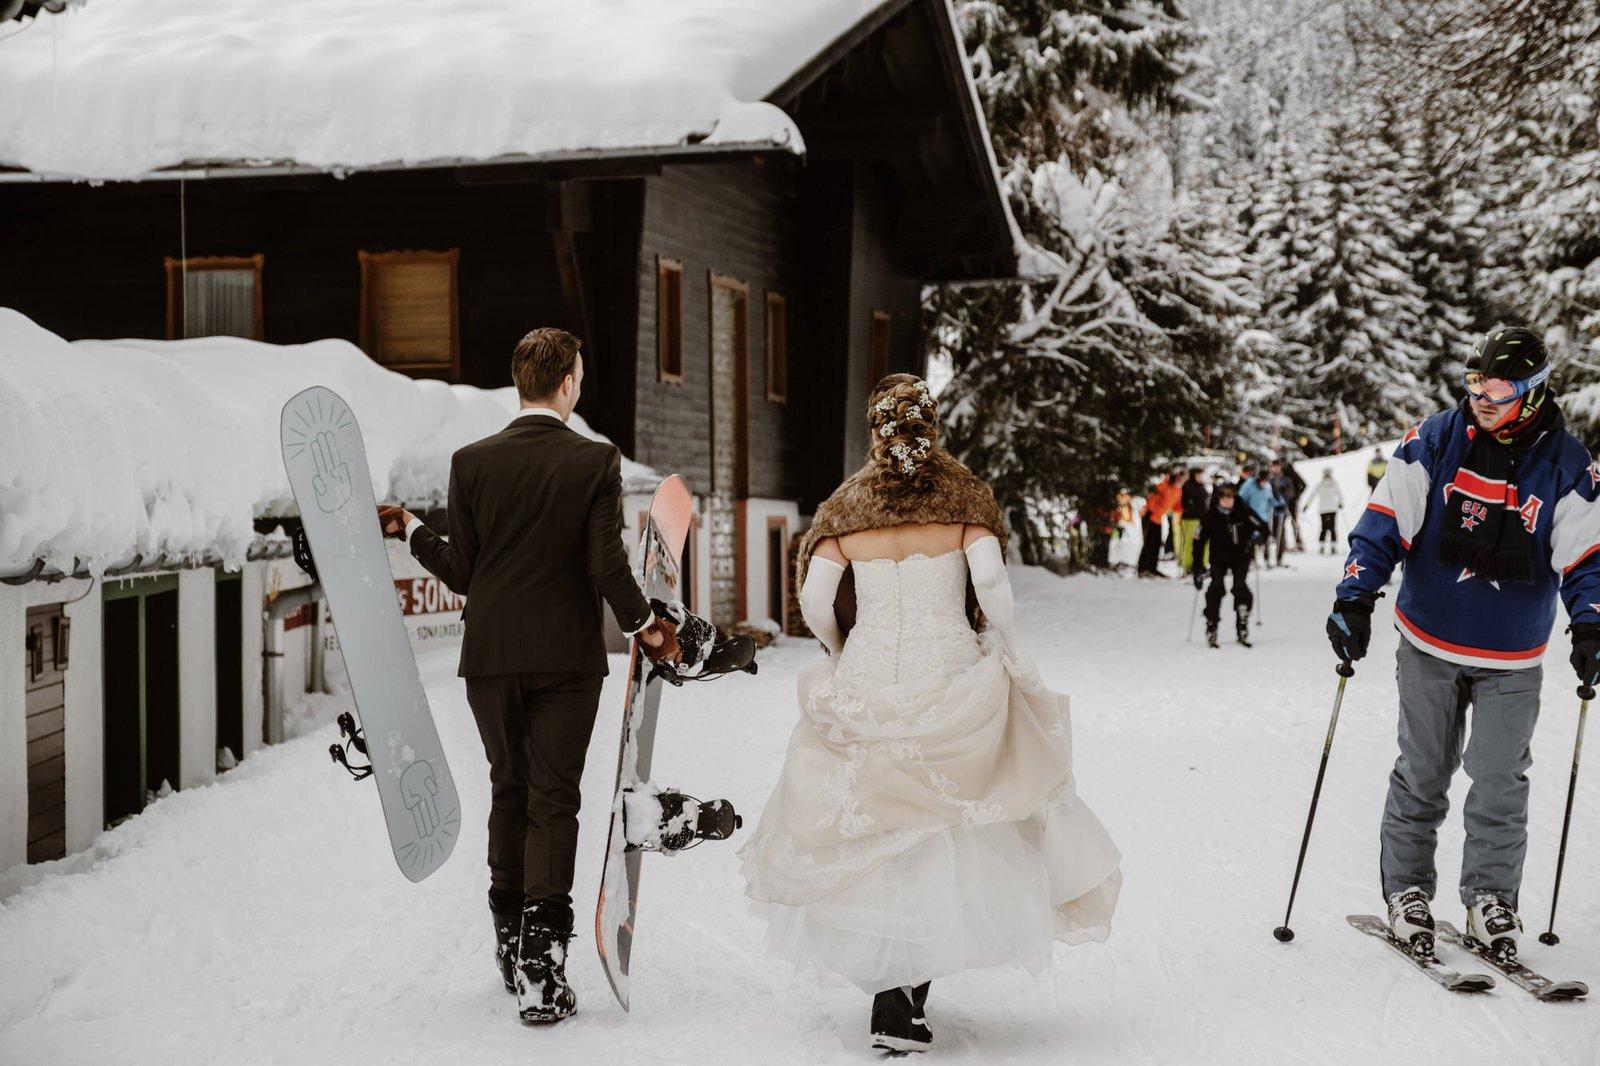 bride and groom go snowboarding